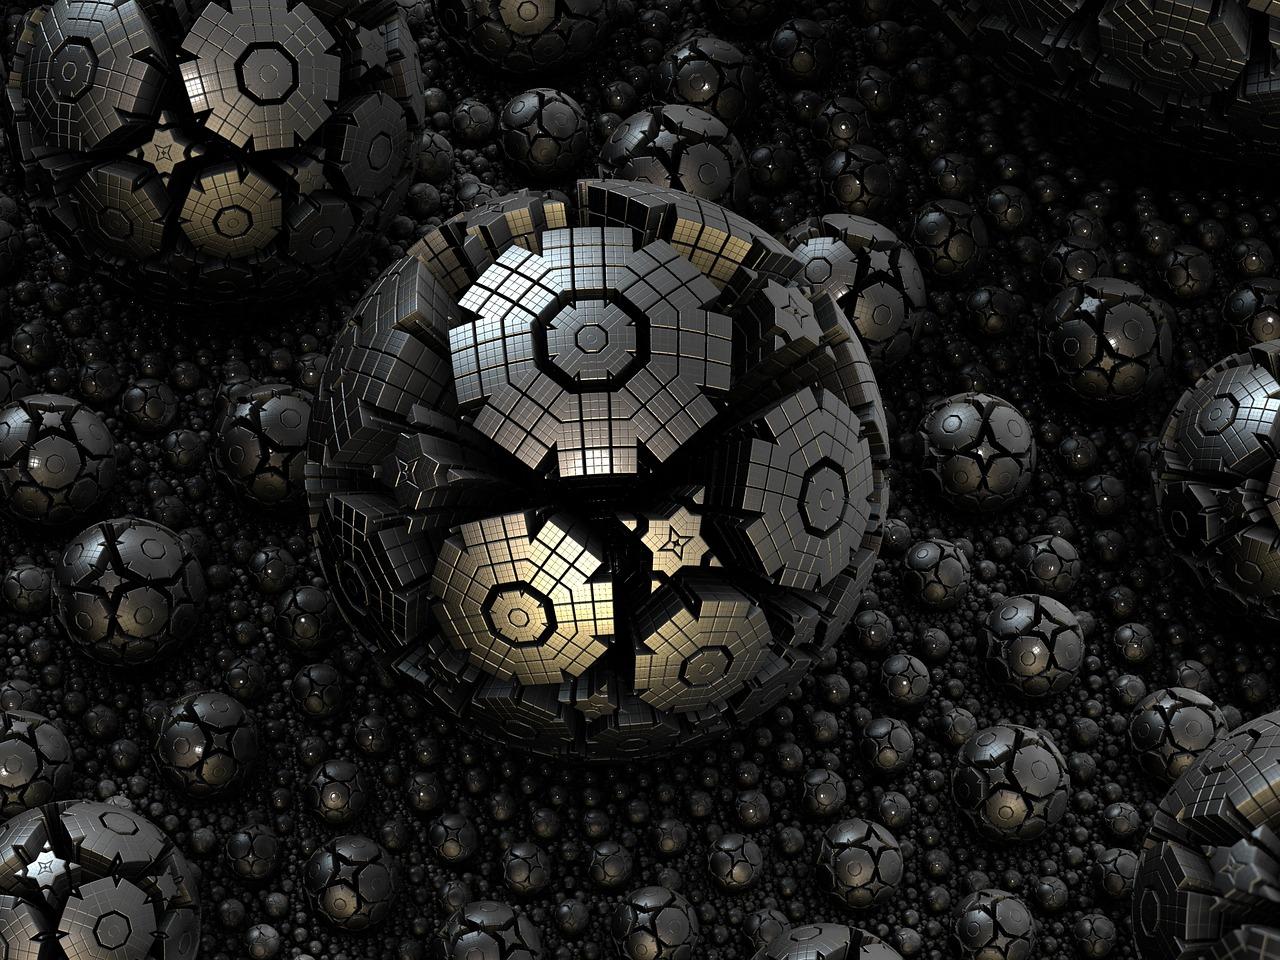 фрактал, шар, пространство